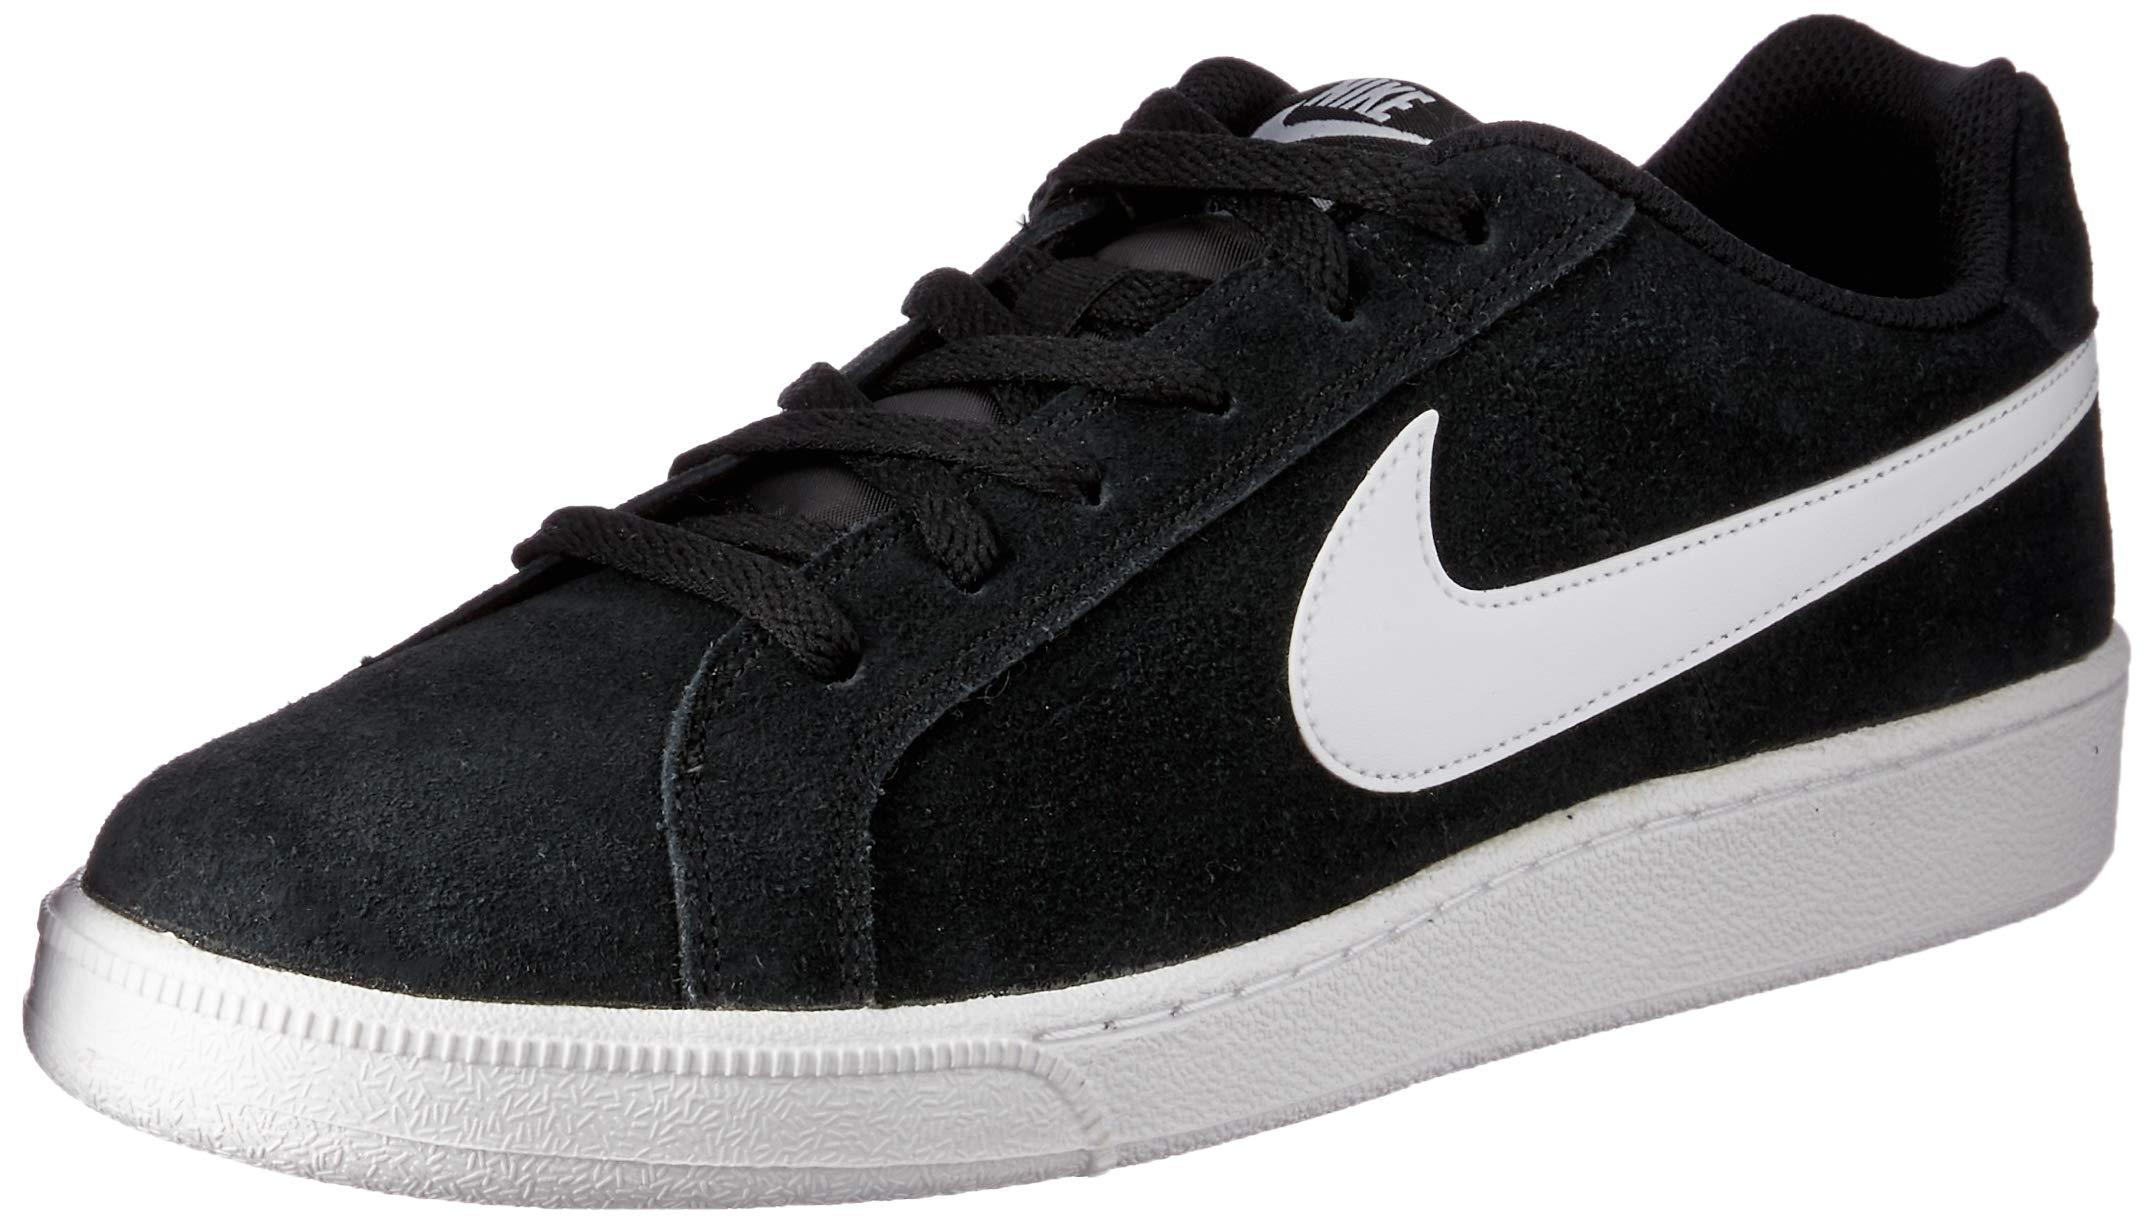 Men's Court Royale Suede Sneakers- Buy